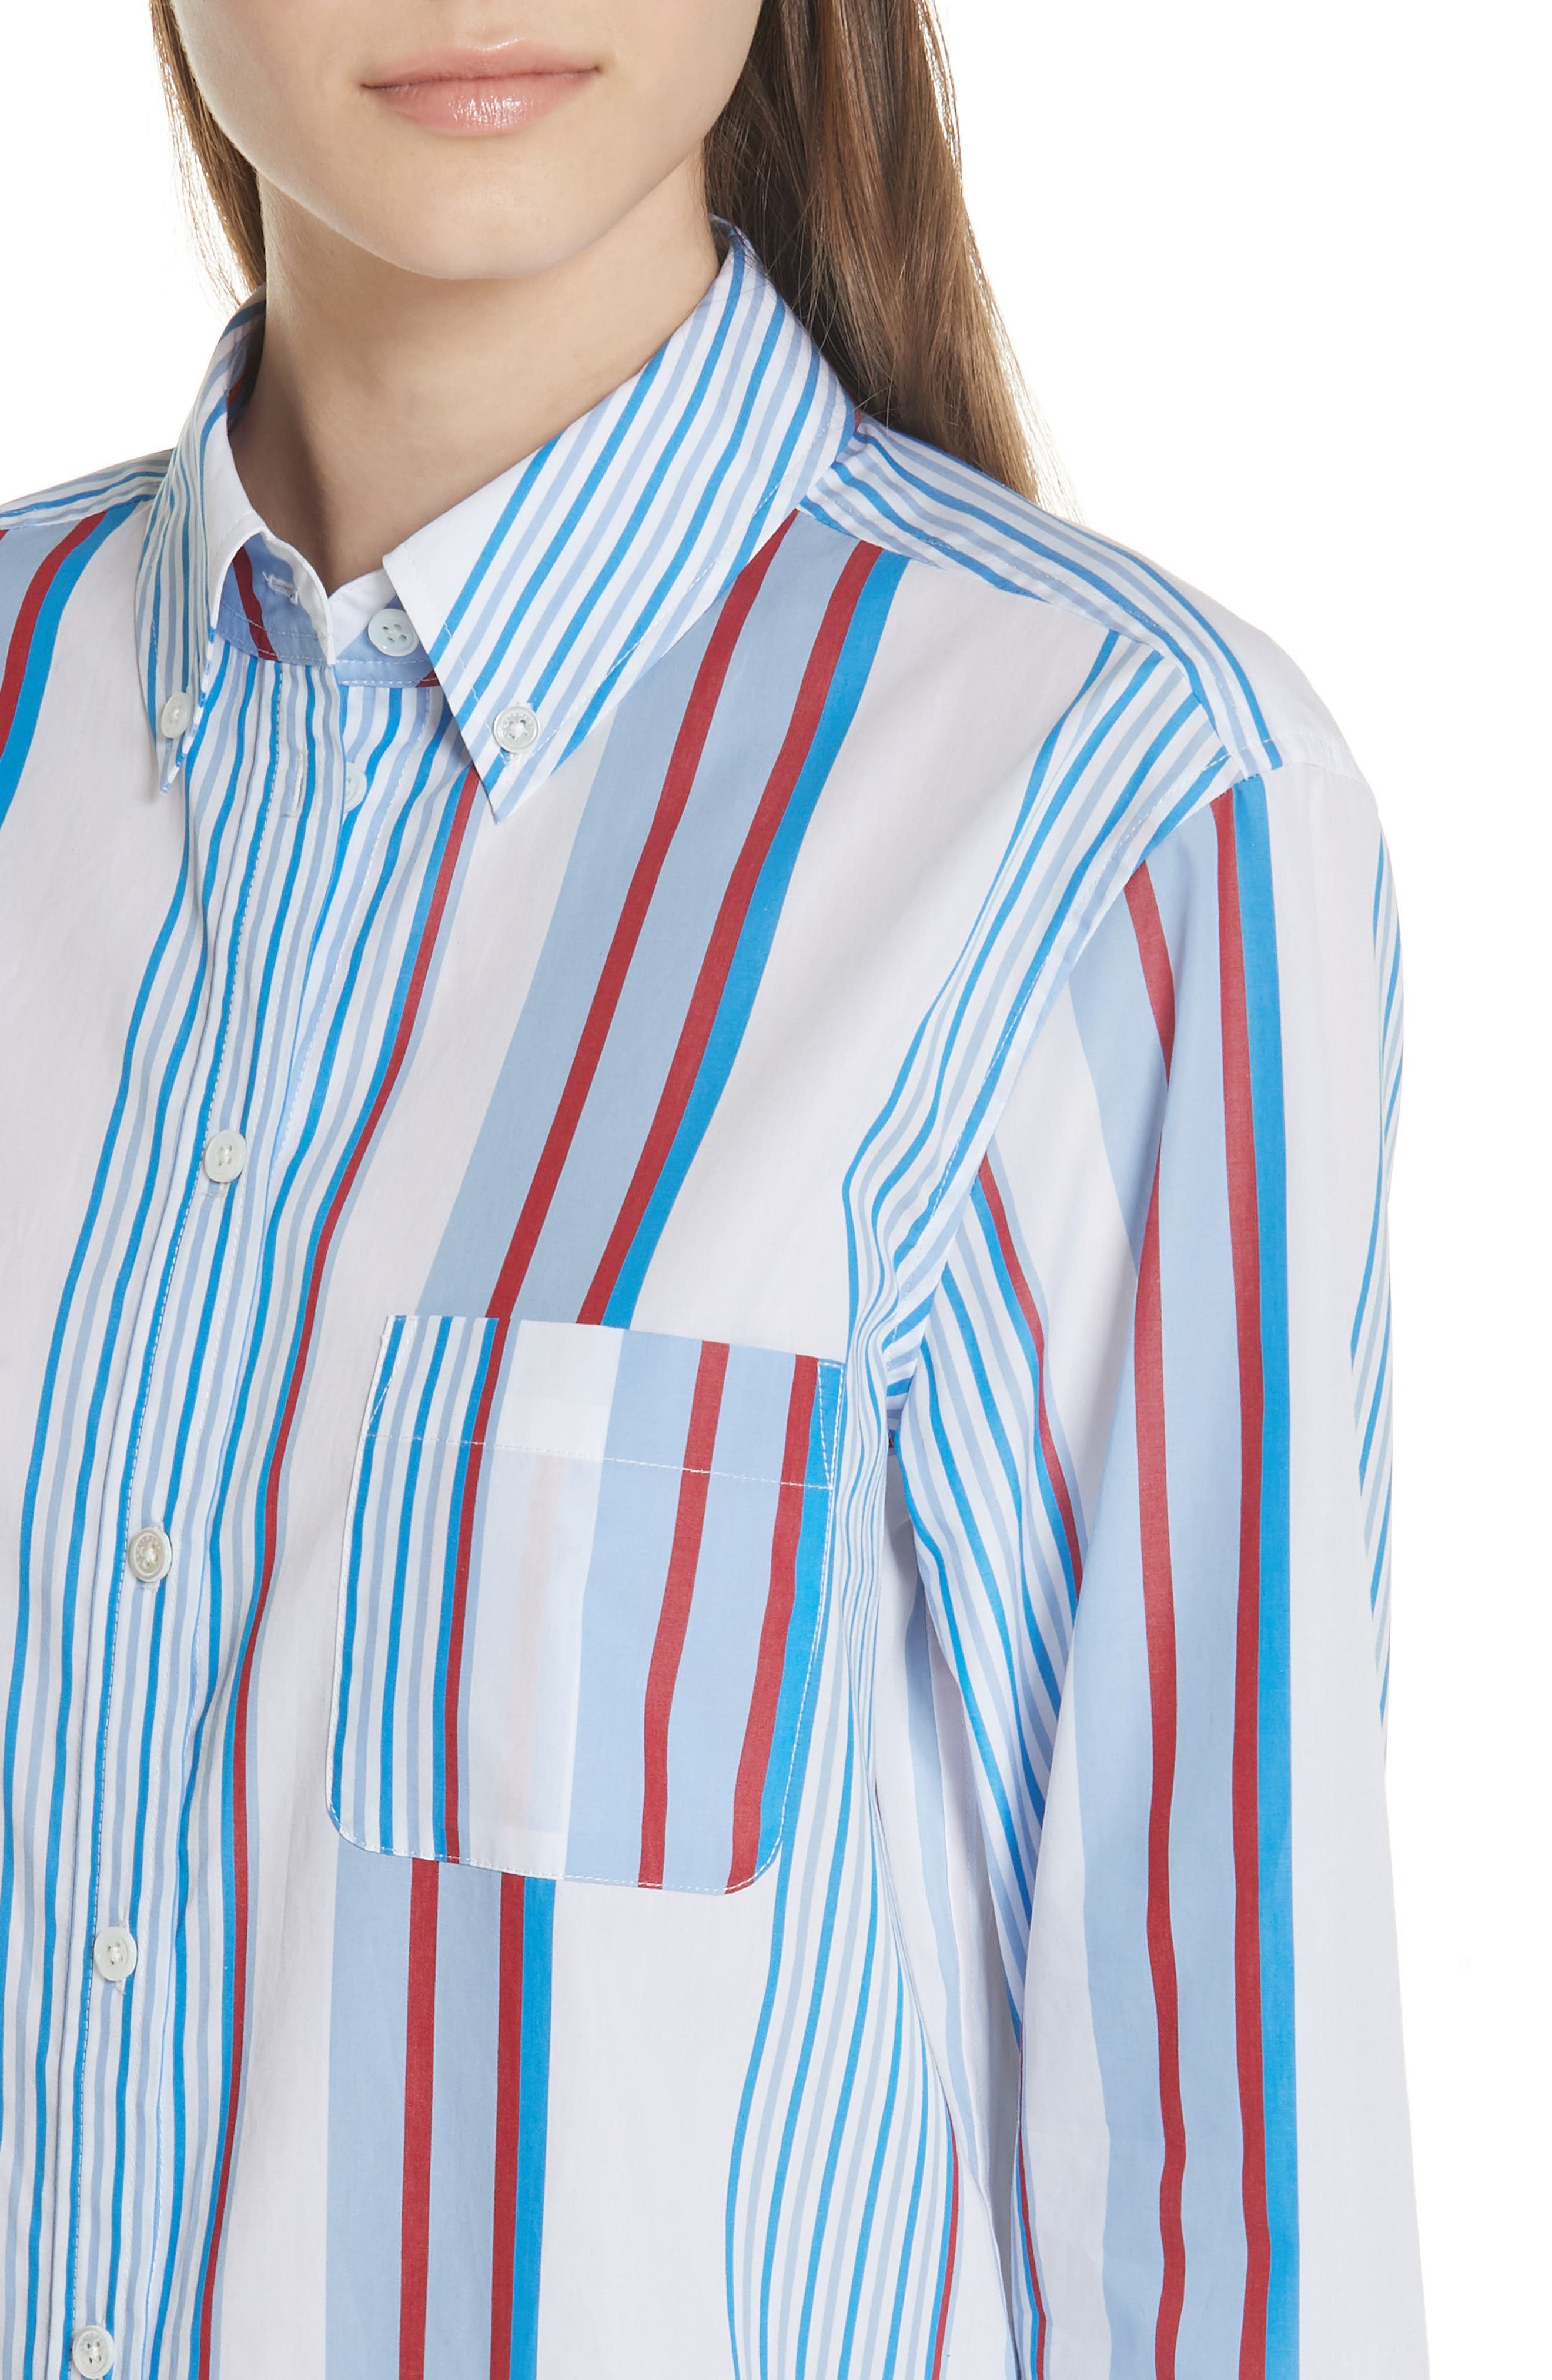 Margaux Stripe Shirt,                             Alternate thumbnail 4, color,                             BLUE WHITE MULTI